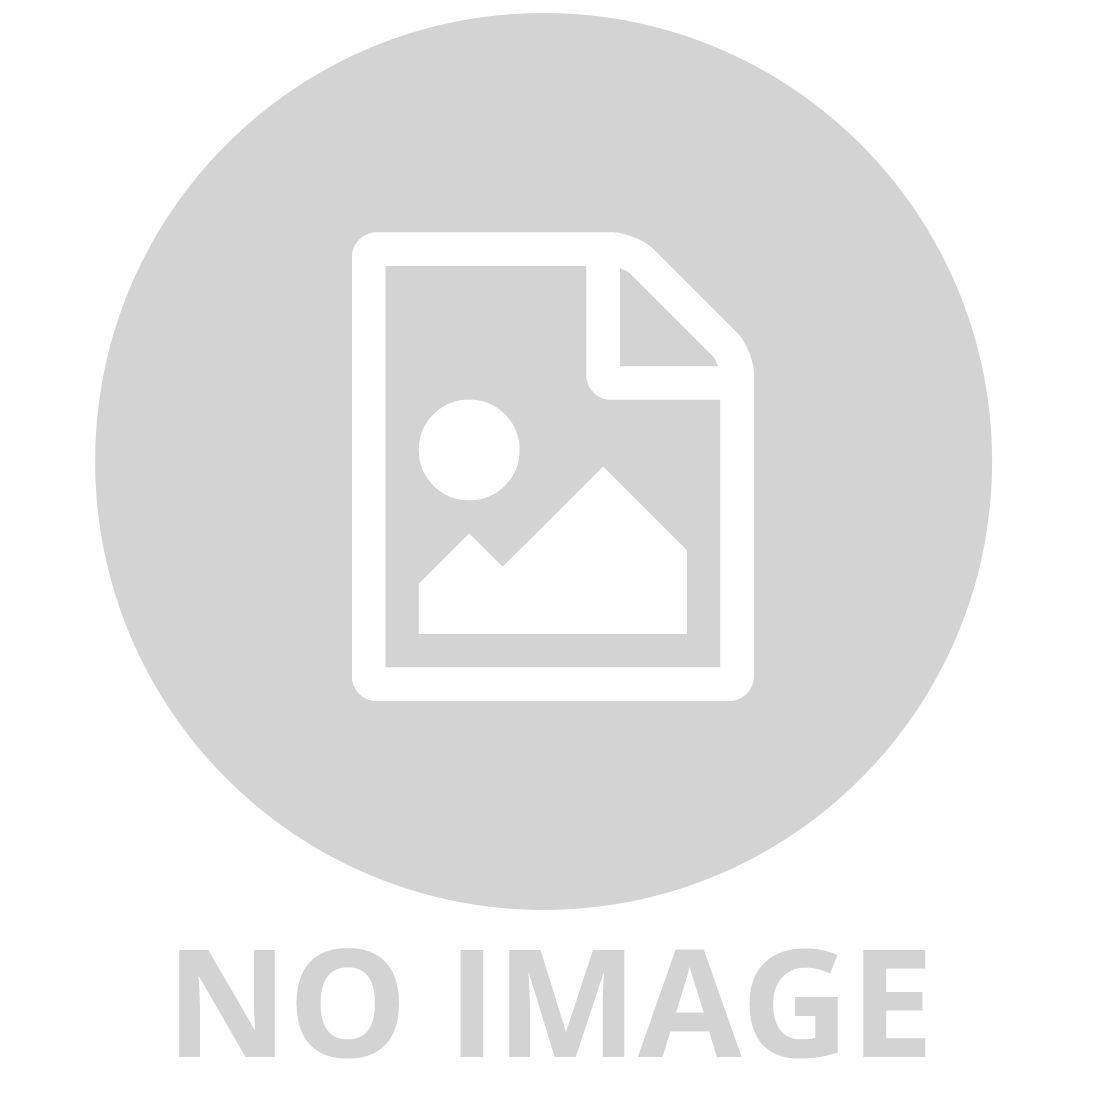 AIRFIX 1:72 FOCKE WULF FW 190A 8 STARTER SET